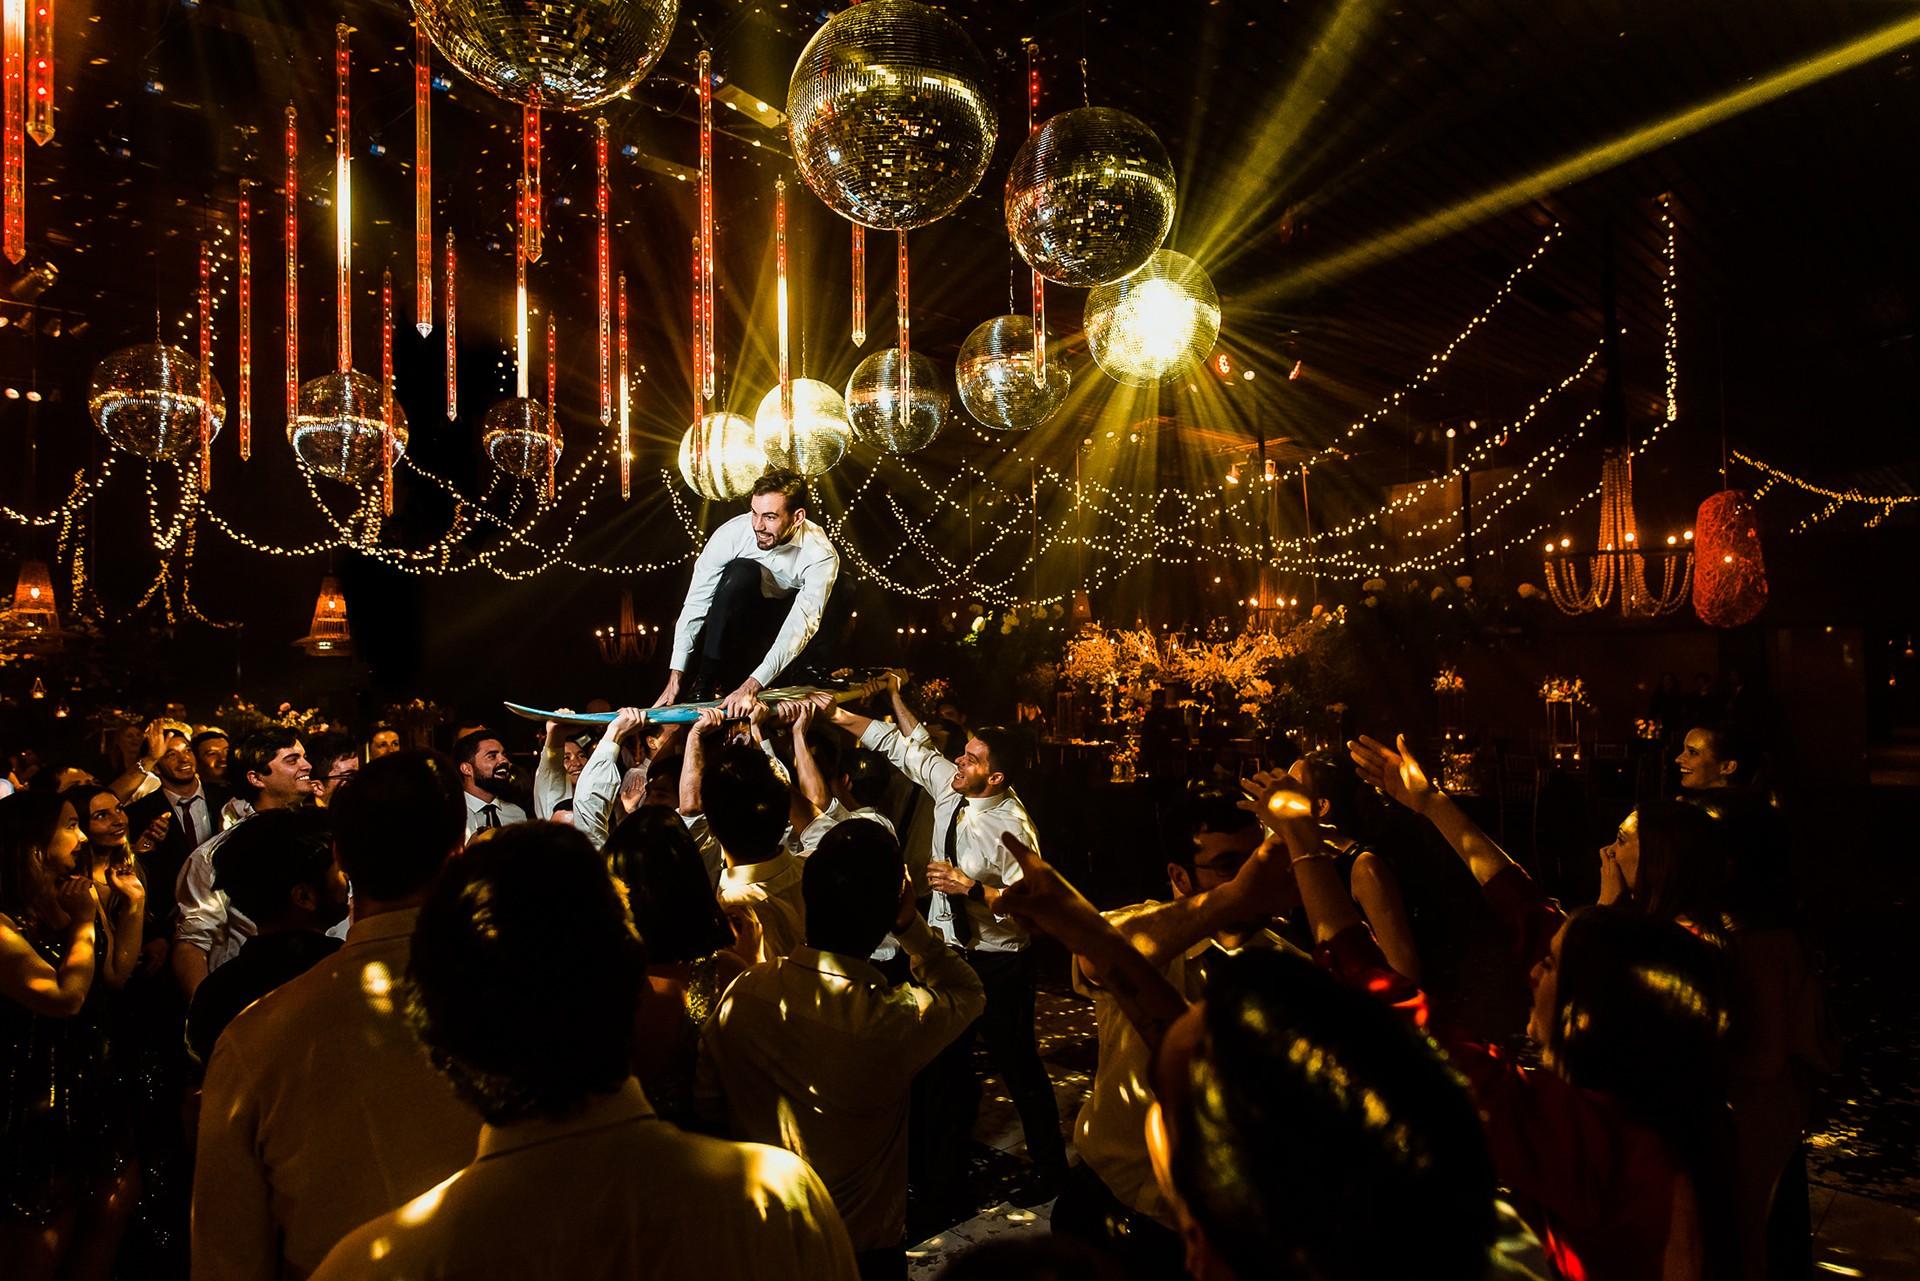 fotografia-de-bodas-españa-valencia-deborah-dantzoff-barcelona-fotografo-destination-wedding-photographer-matrimonio-chile-uruguay-argentina